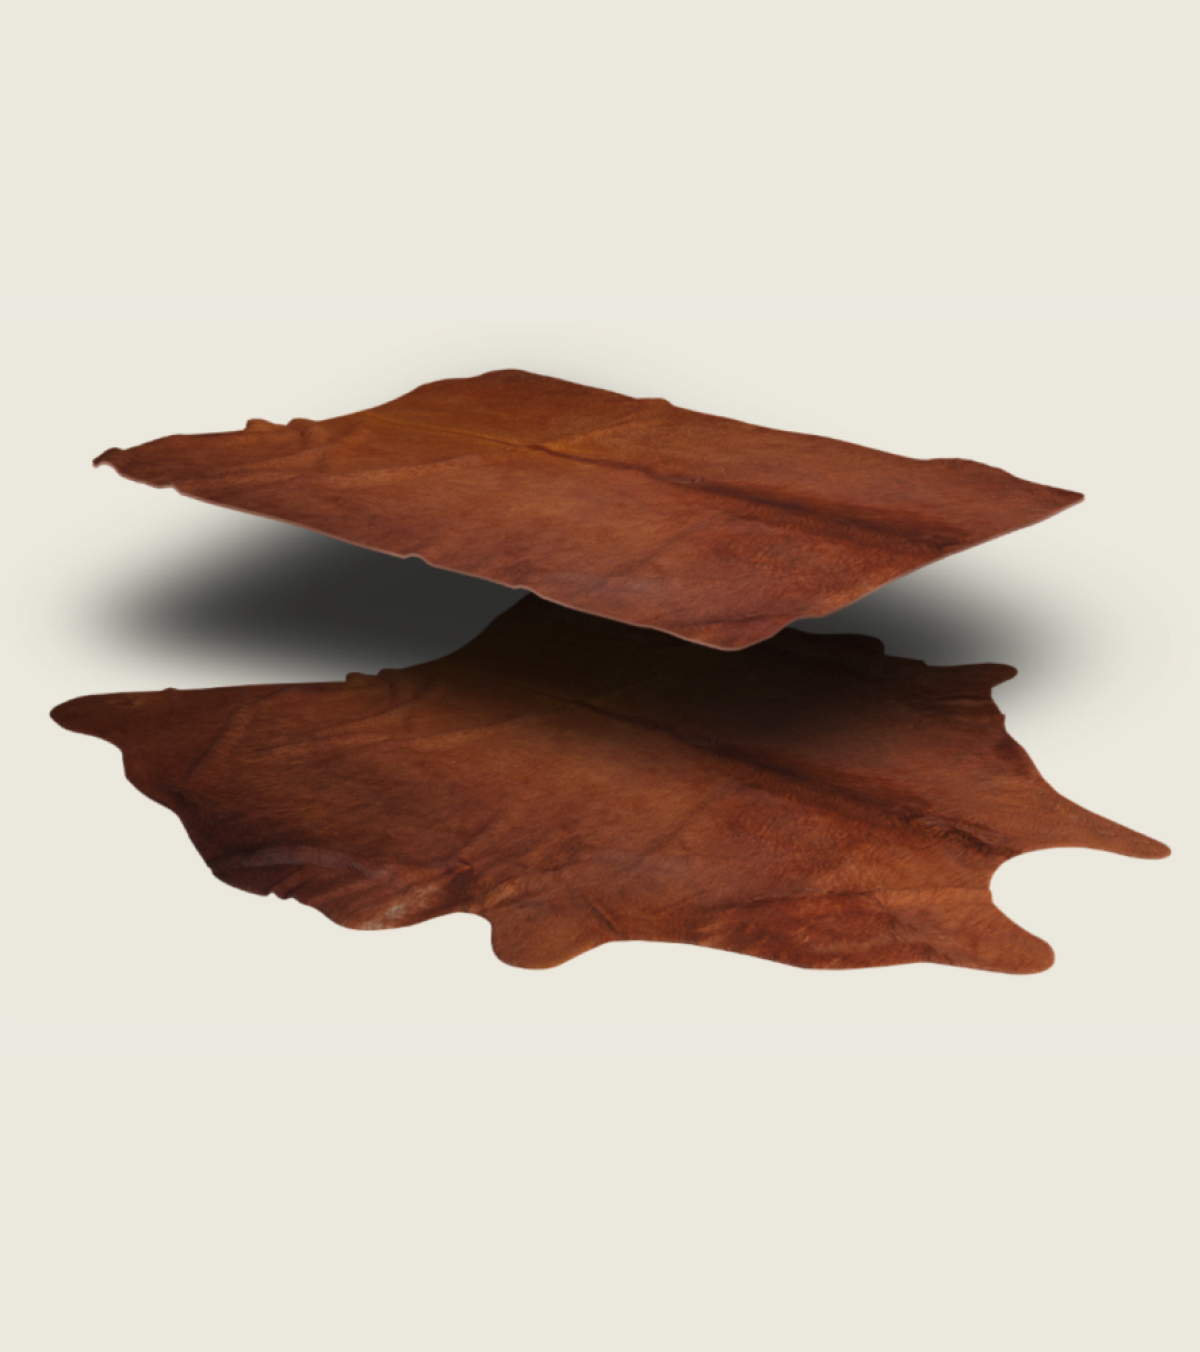 Banner - a inovação do kind leather